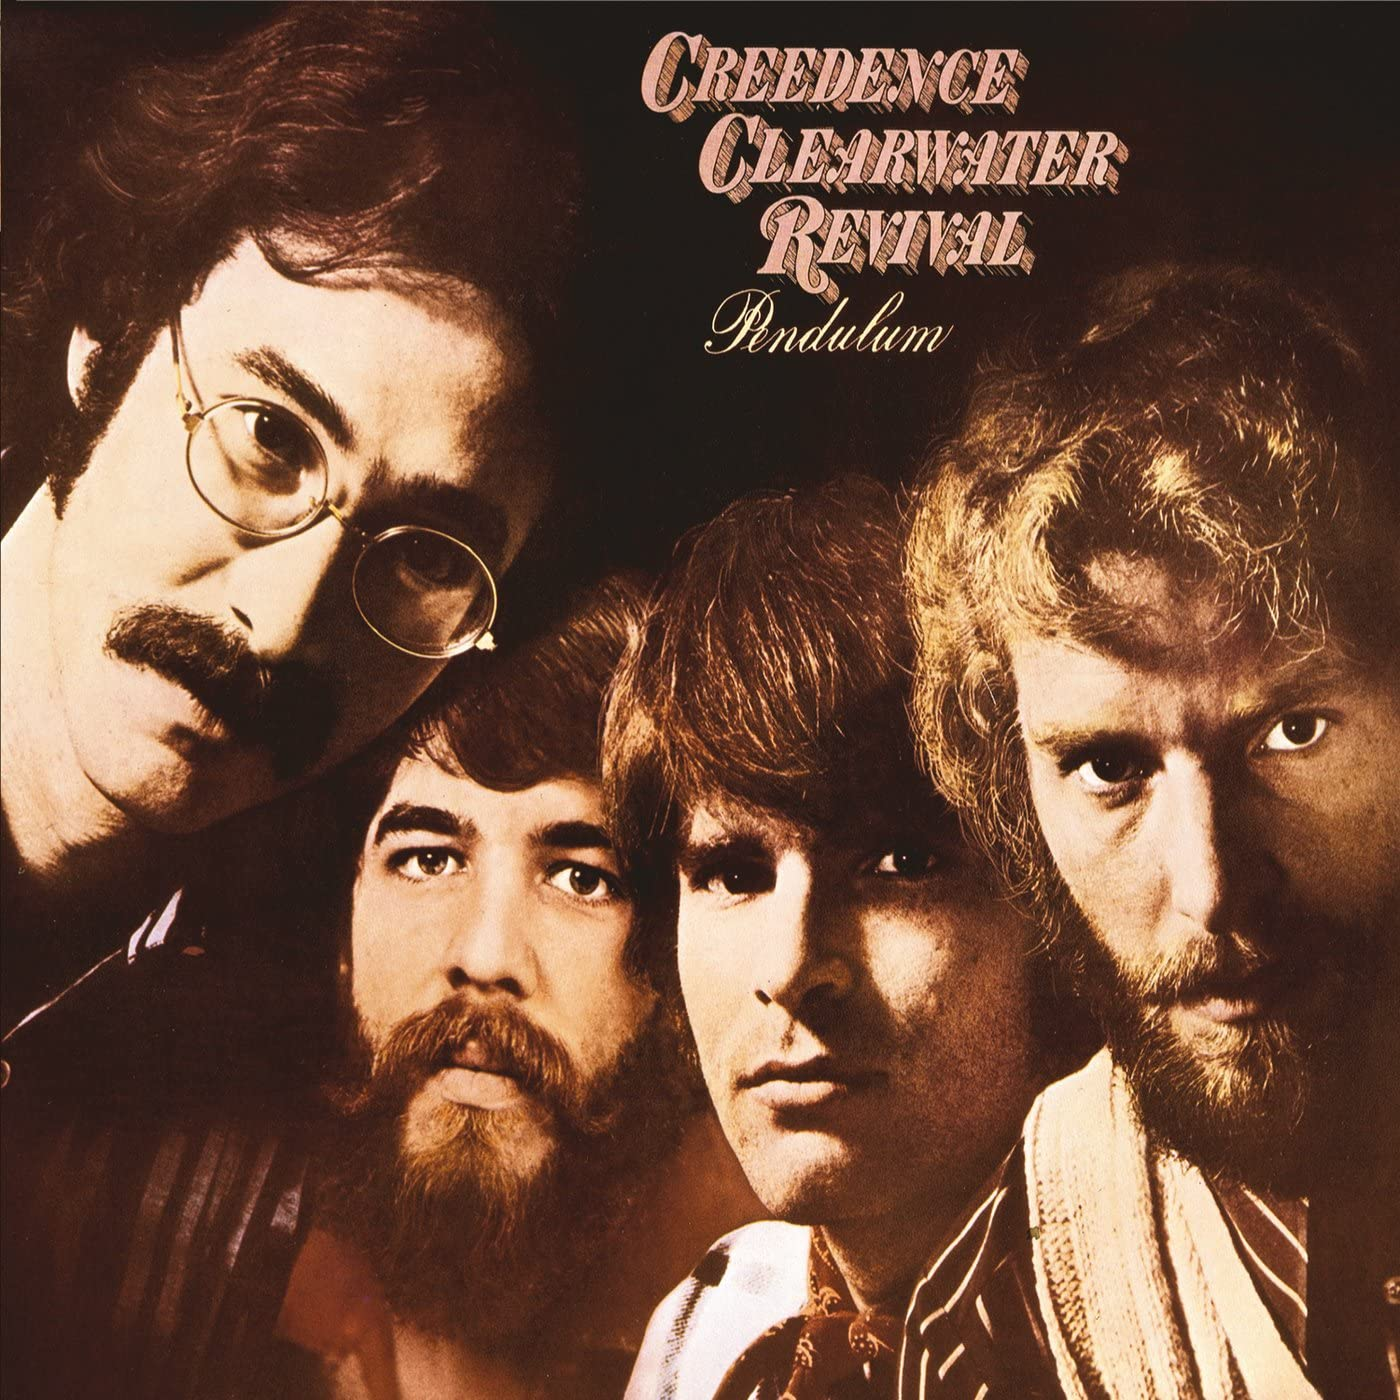 Pendulum - Creedence Clearwater Revival